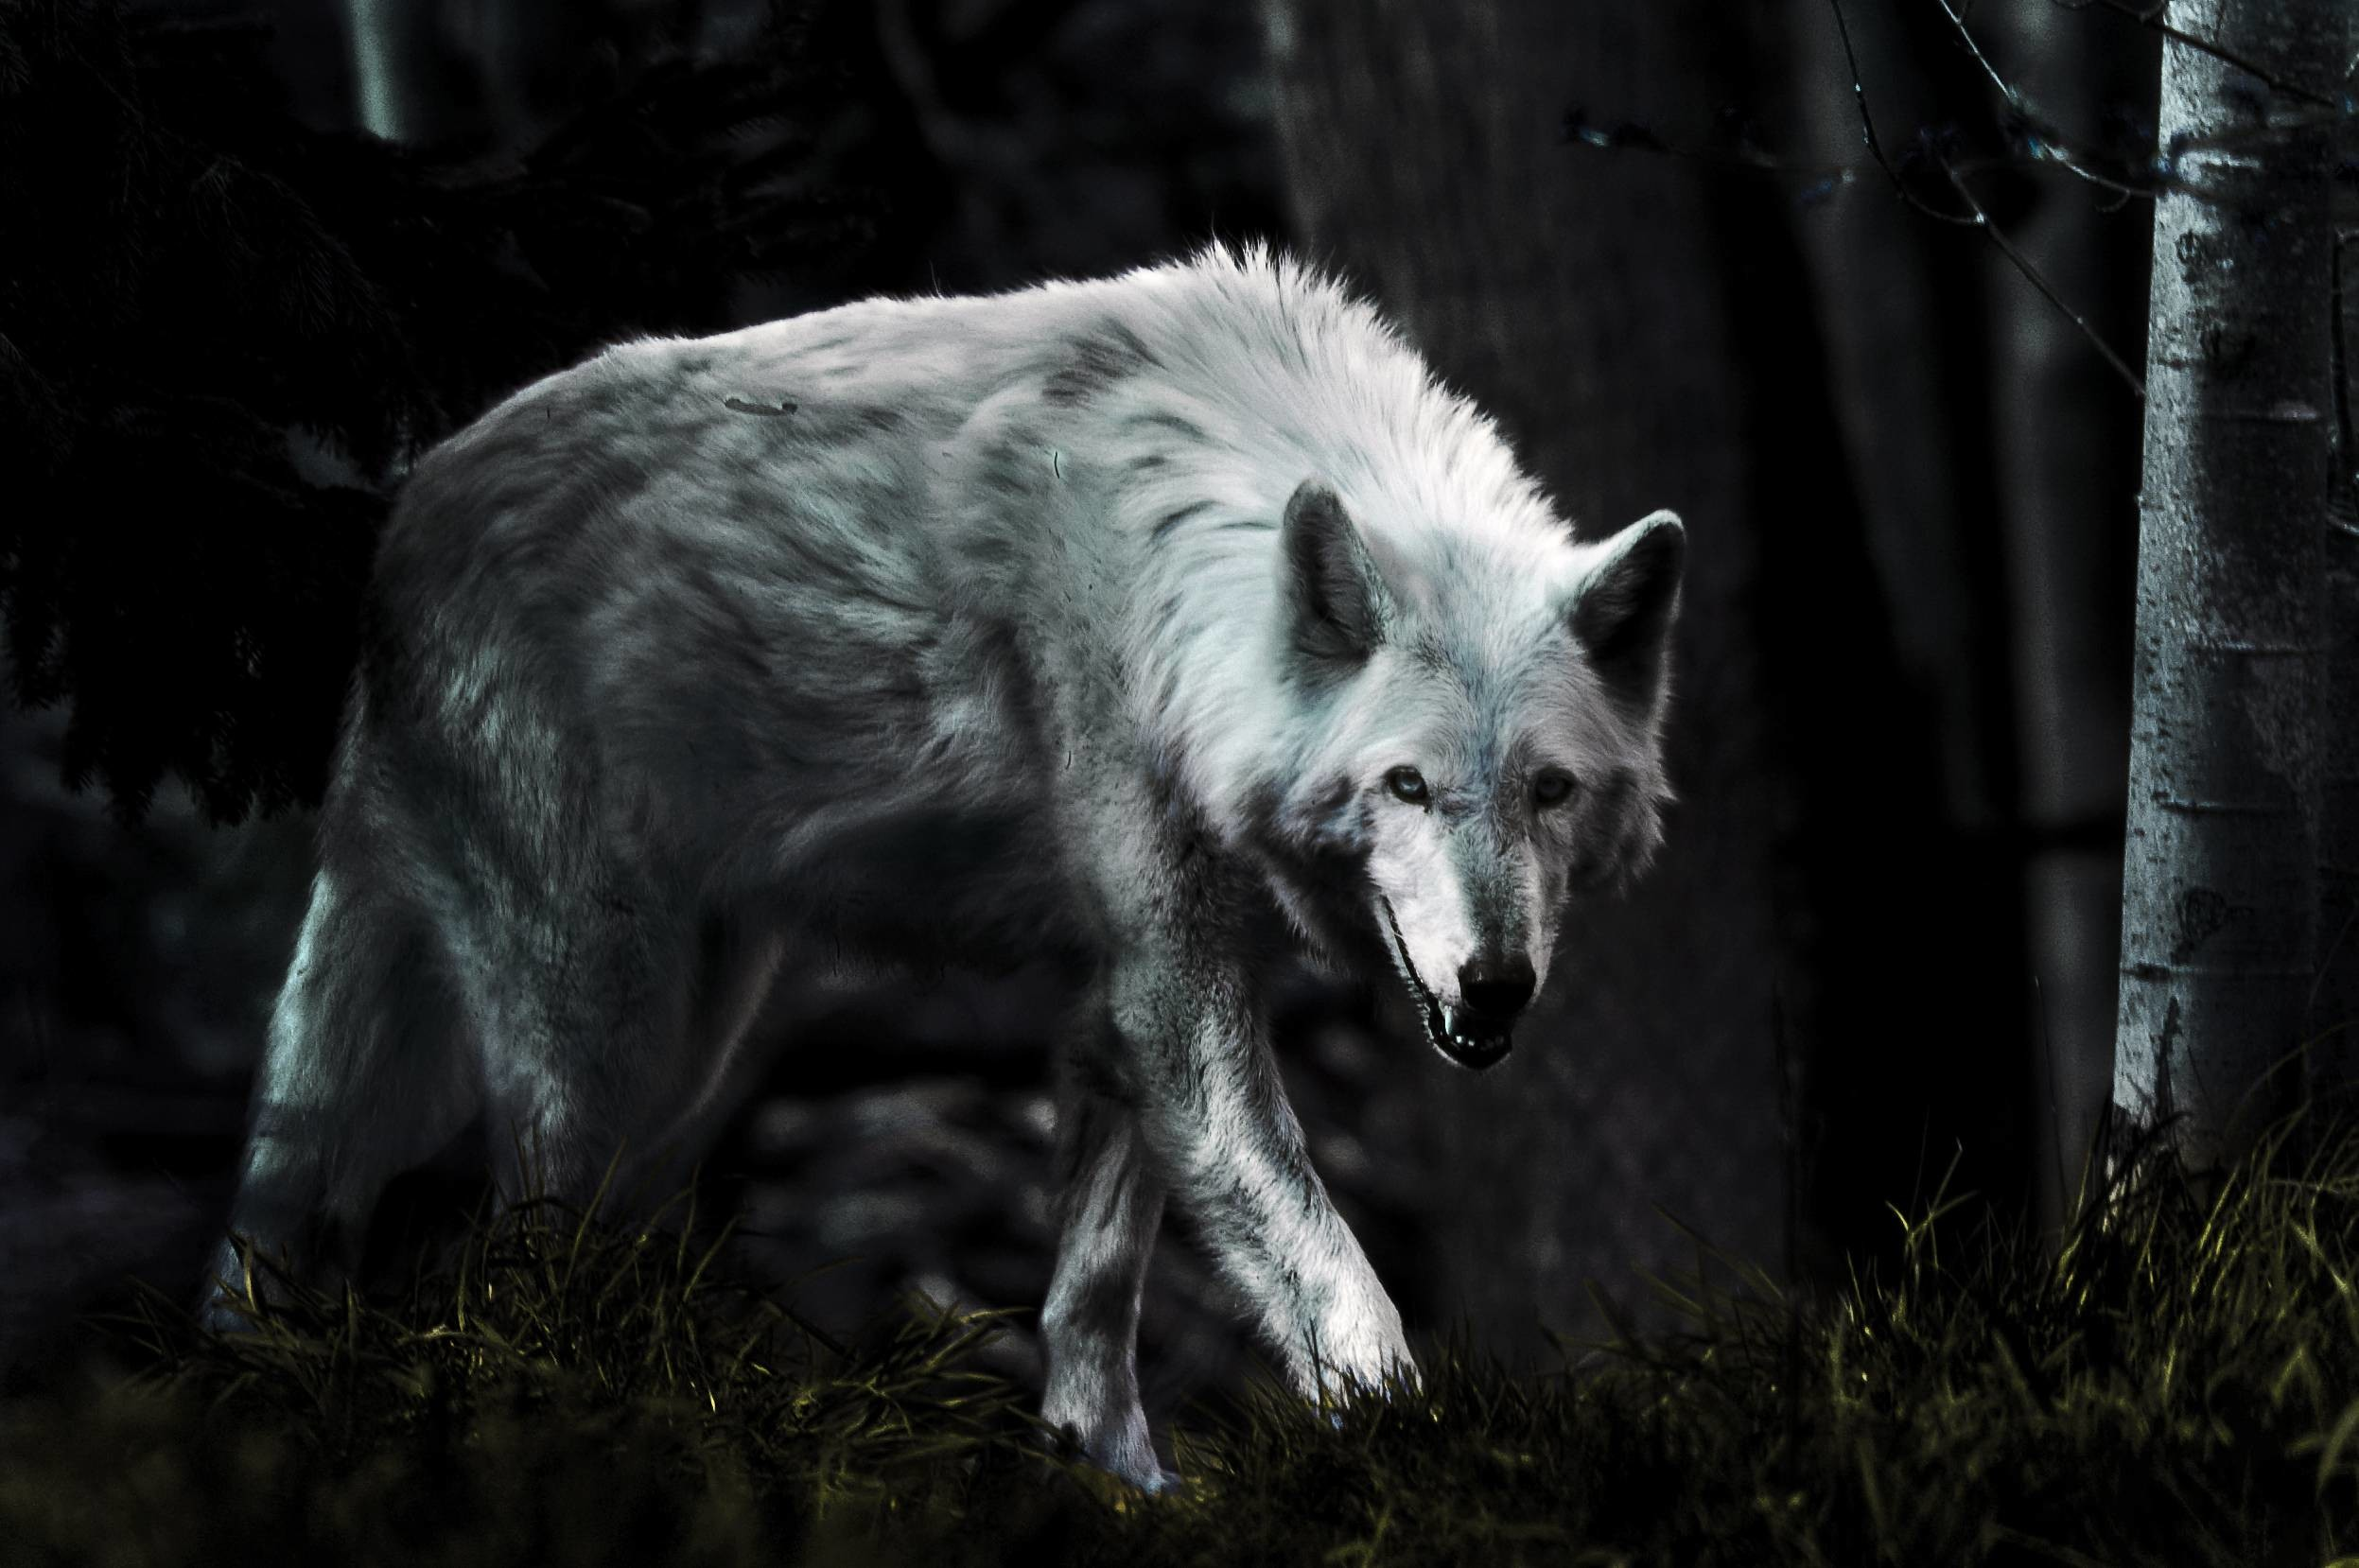 Dark Wolf HD Photo Wallpaper – HD Wallpapers|WallForU.com